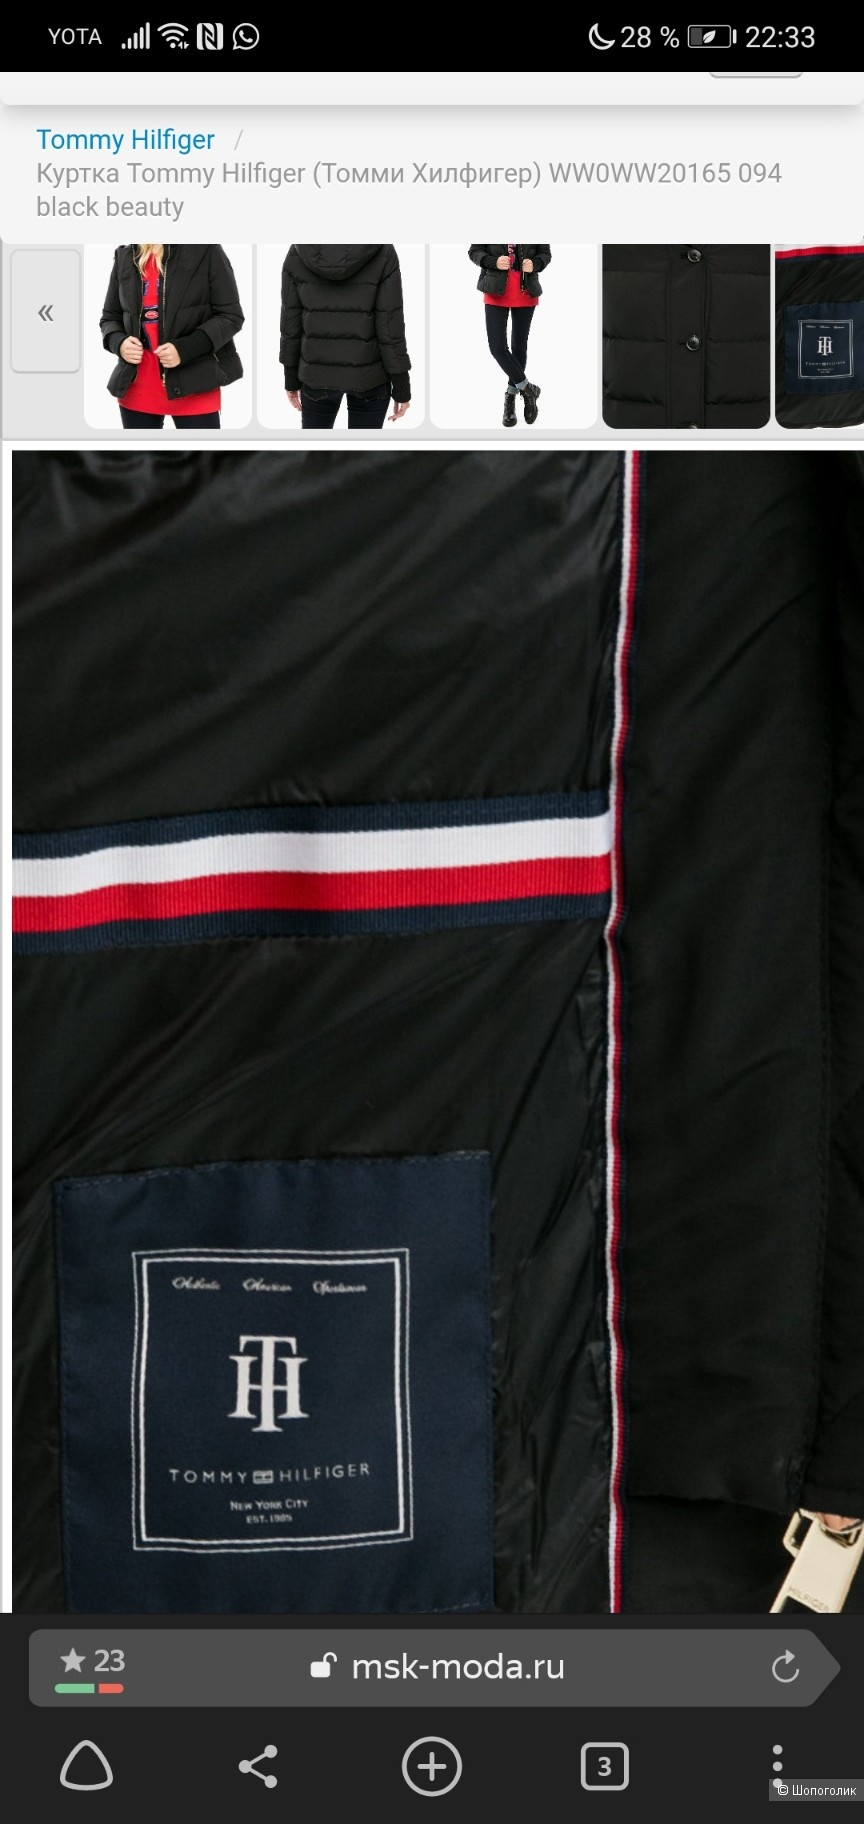 Куртка пуховик Tommy Hilfiger. P42-44